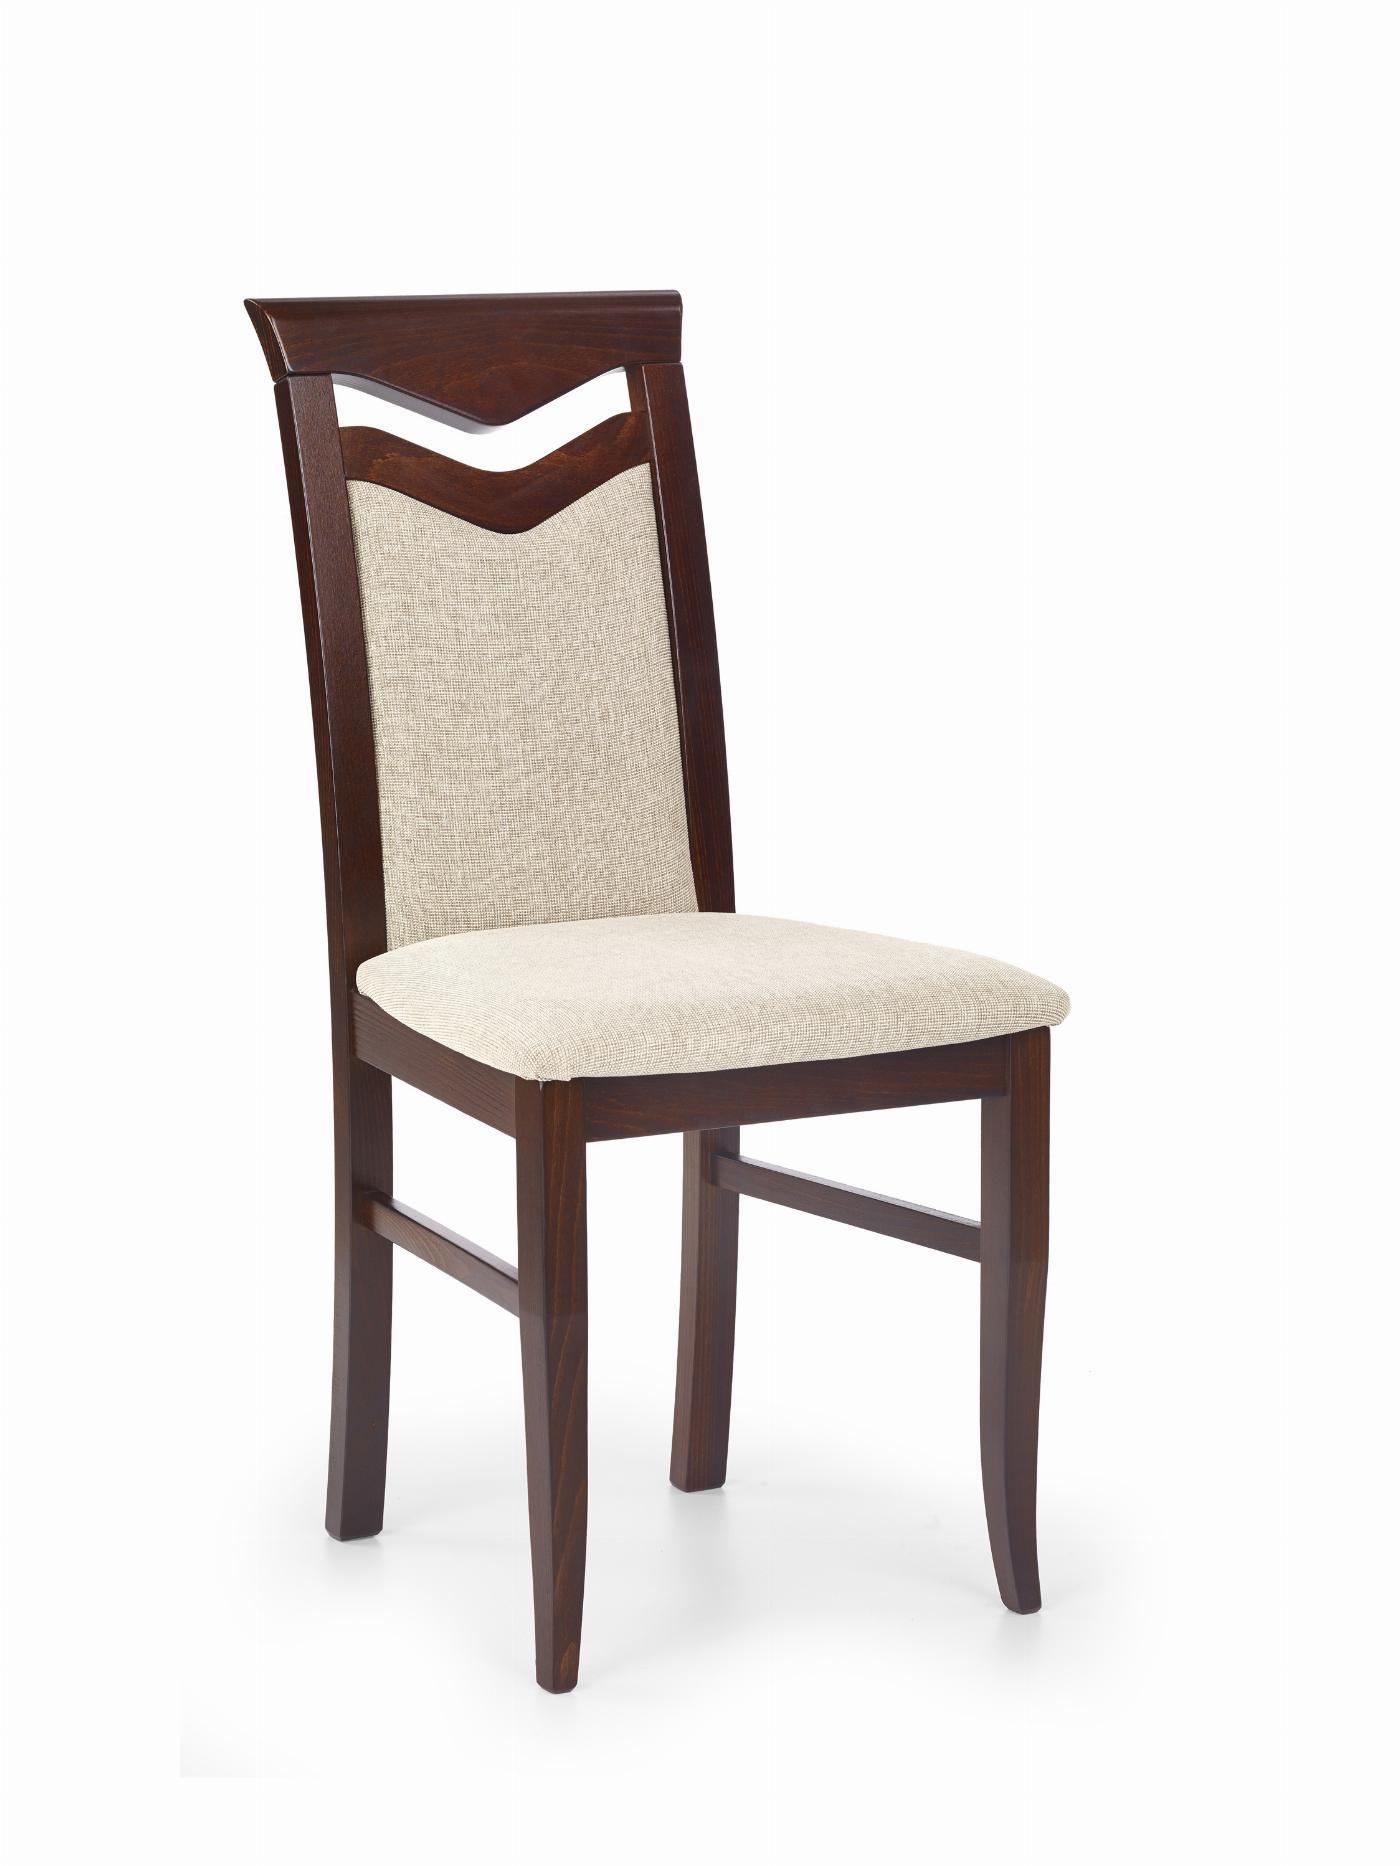 CITRONE krzesło ciemny orzech / tap: VILA 2 (1p=2szt)